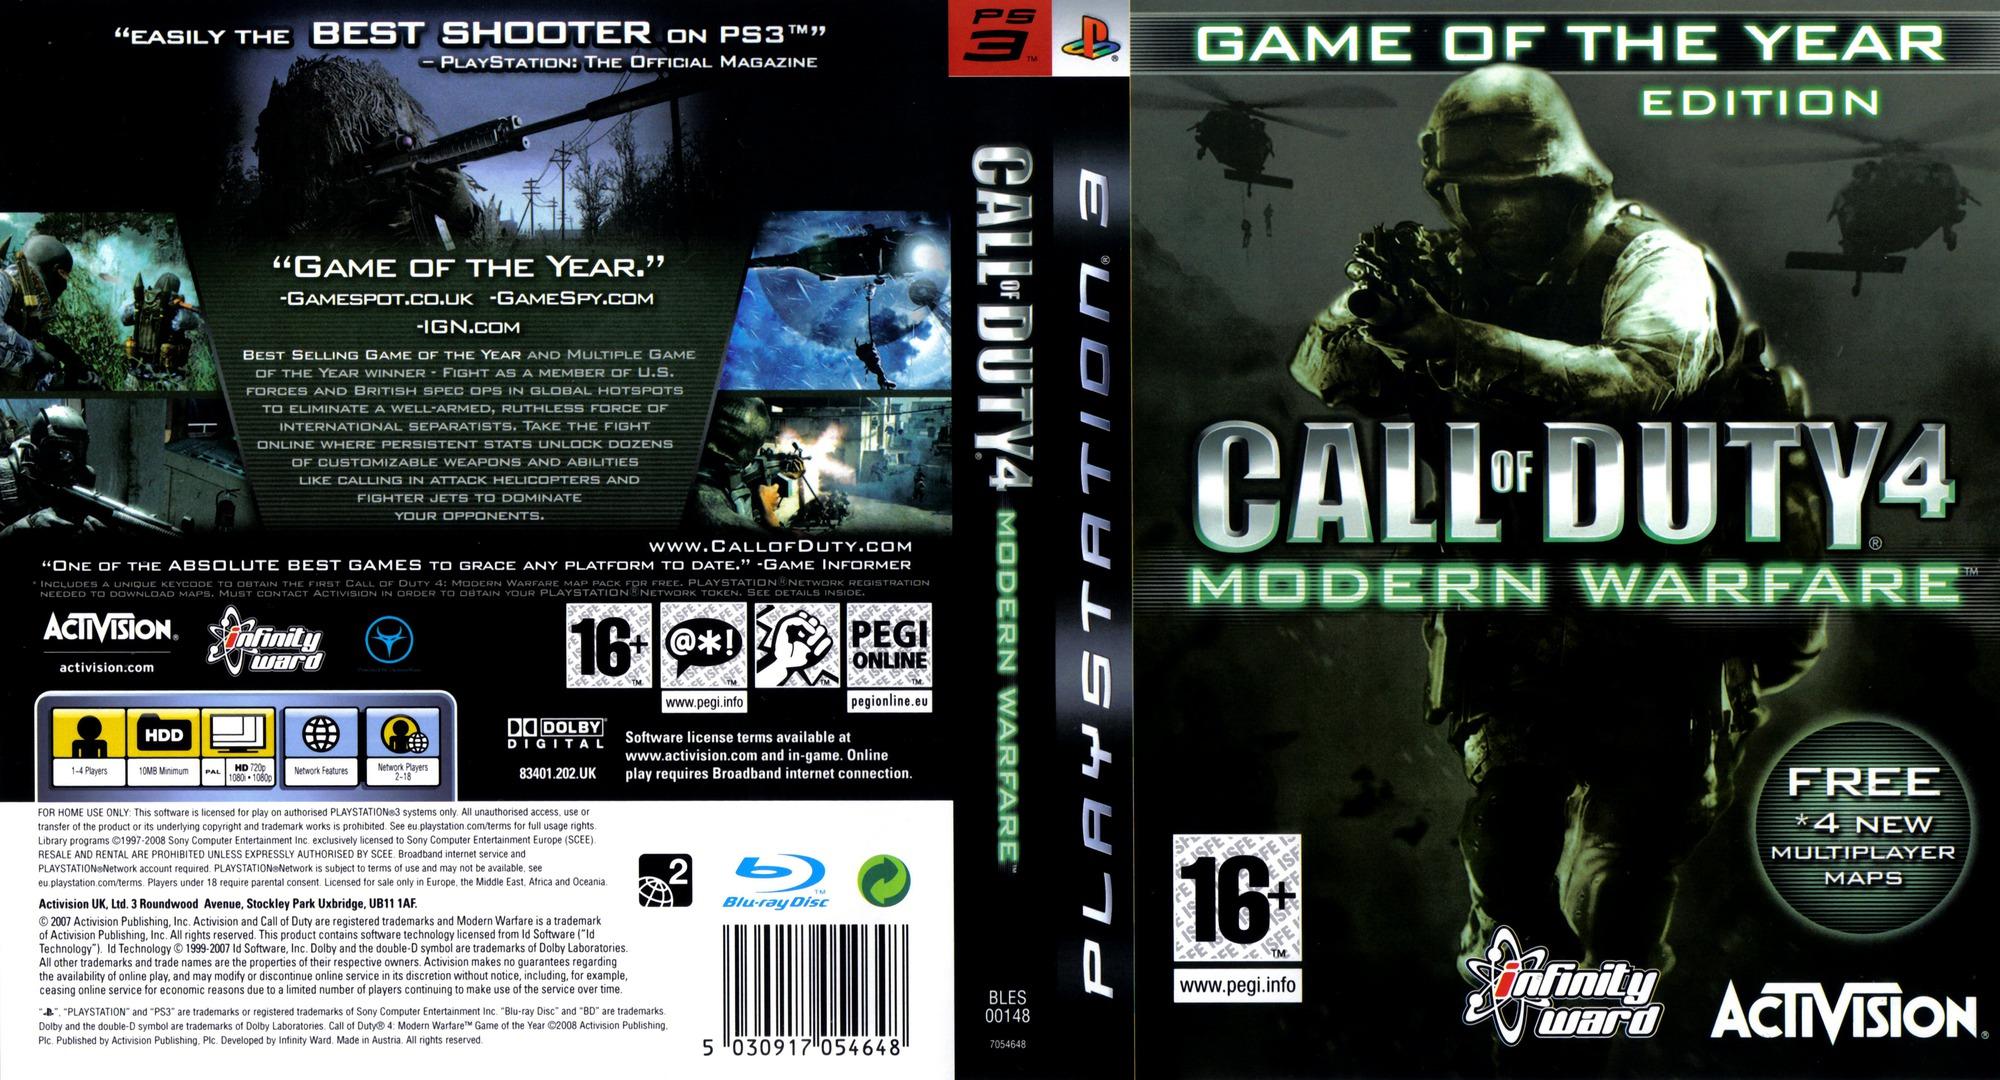 Bles00148 Call Of Duty 4 Modern Warfare